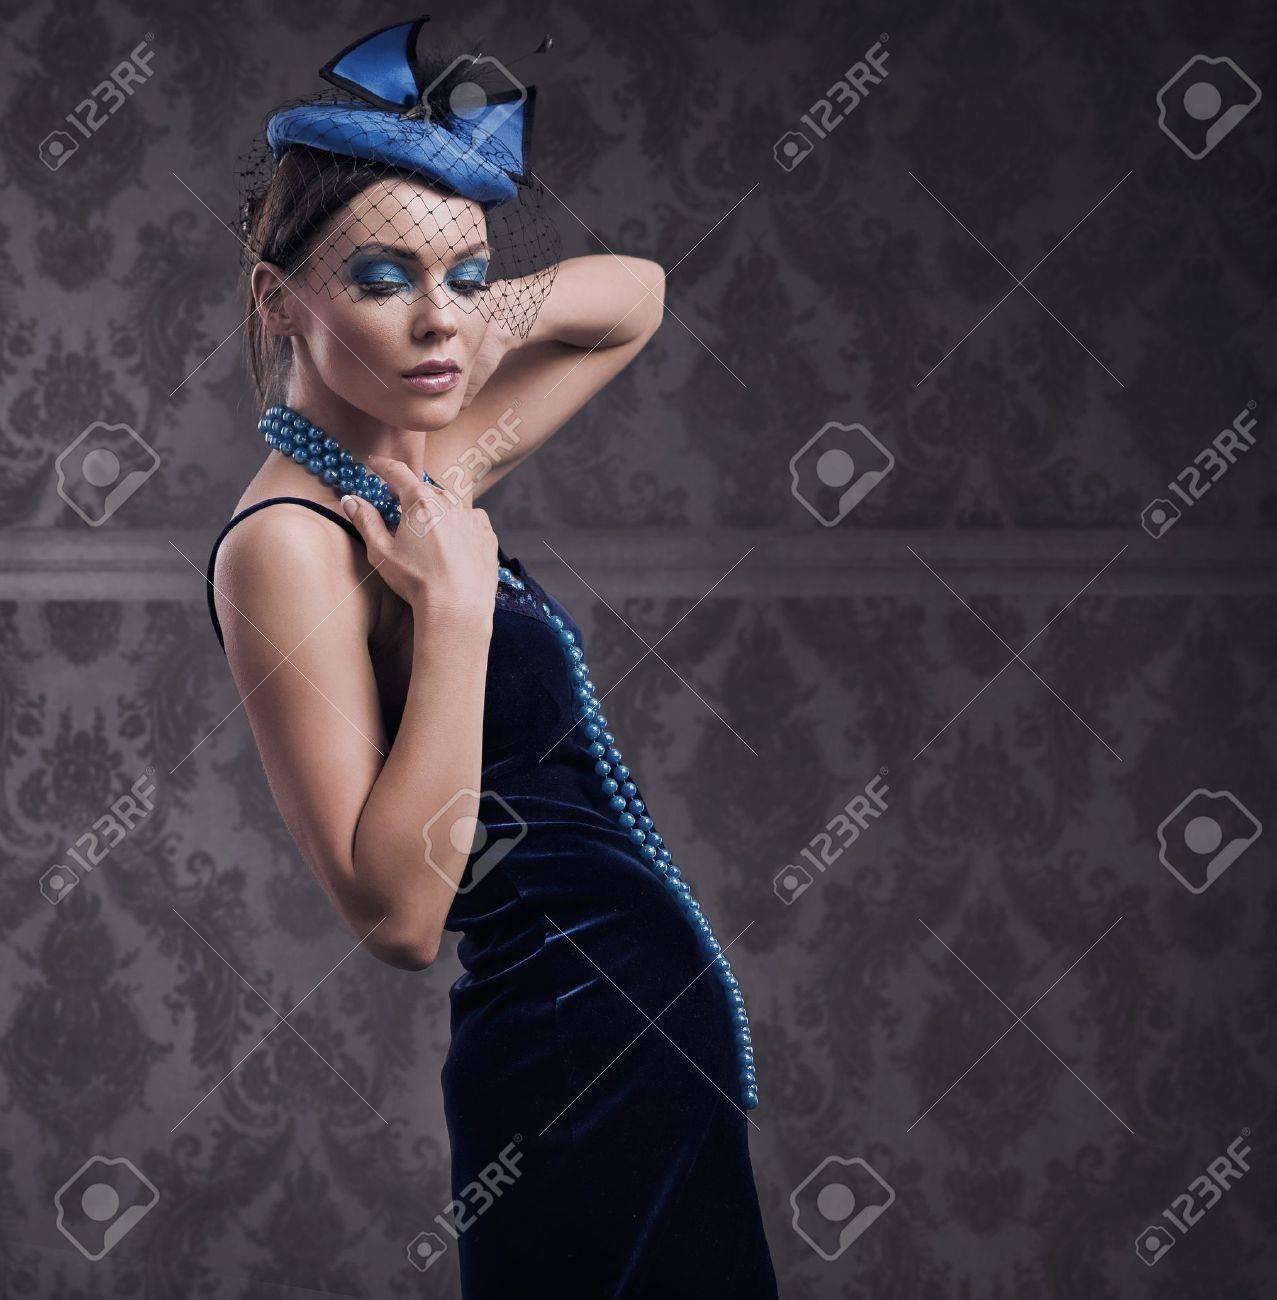 Vogue style sensual portrait in dim light Stock Photo - 8254958